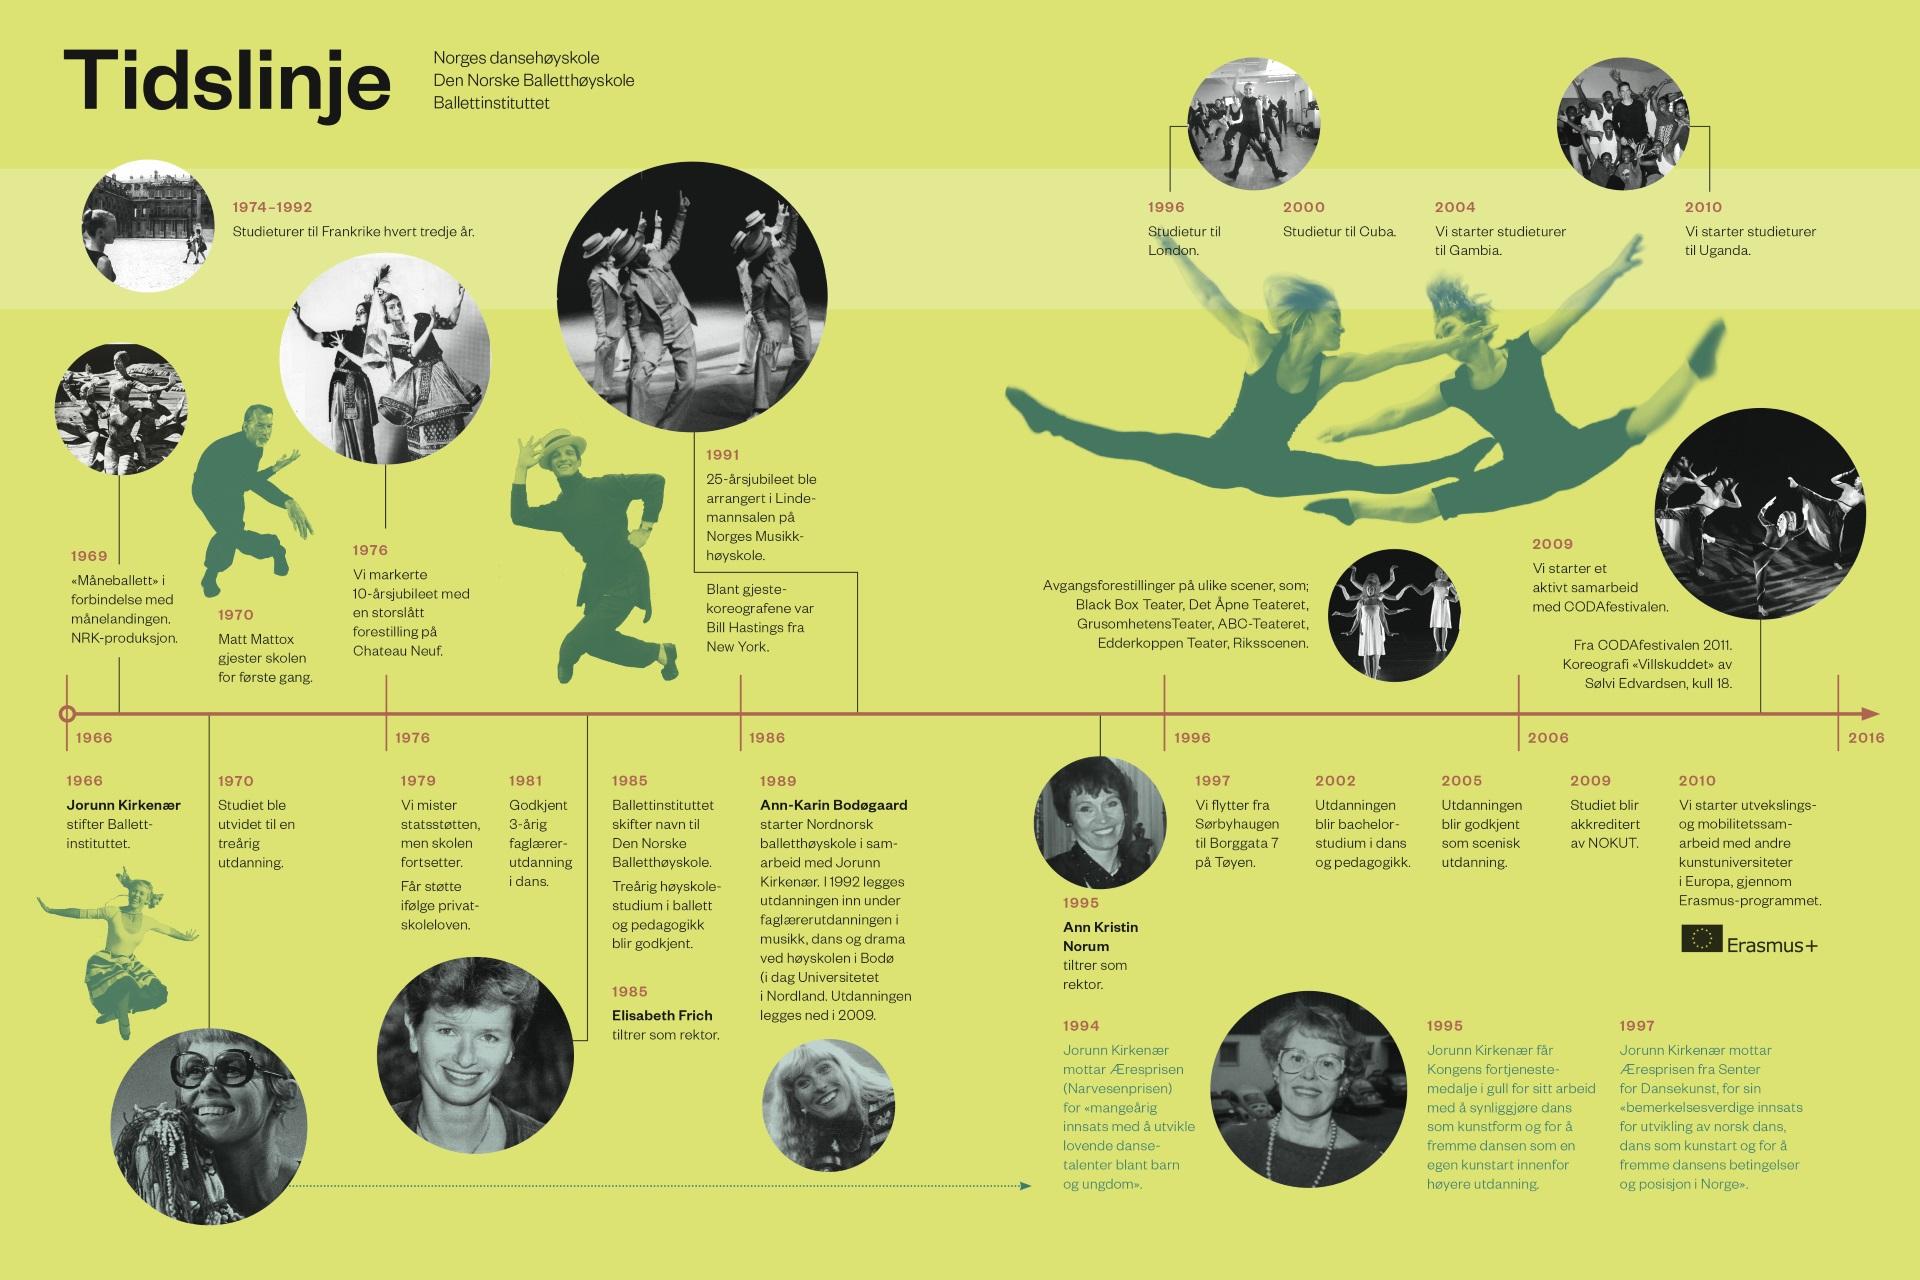 Tidslinje - Norges dansehøyskole